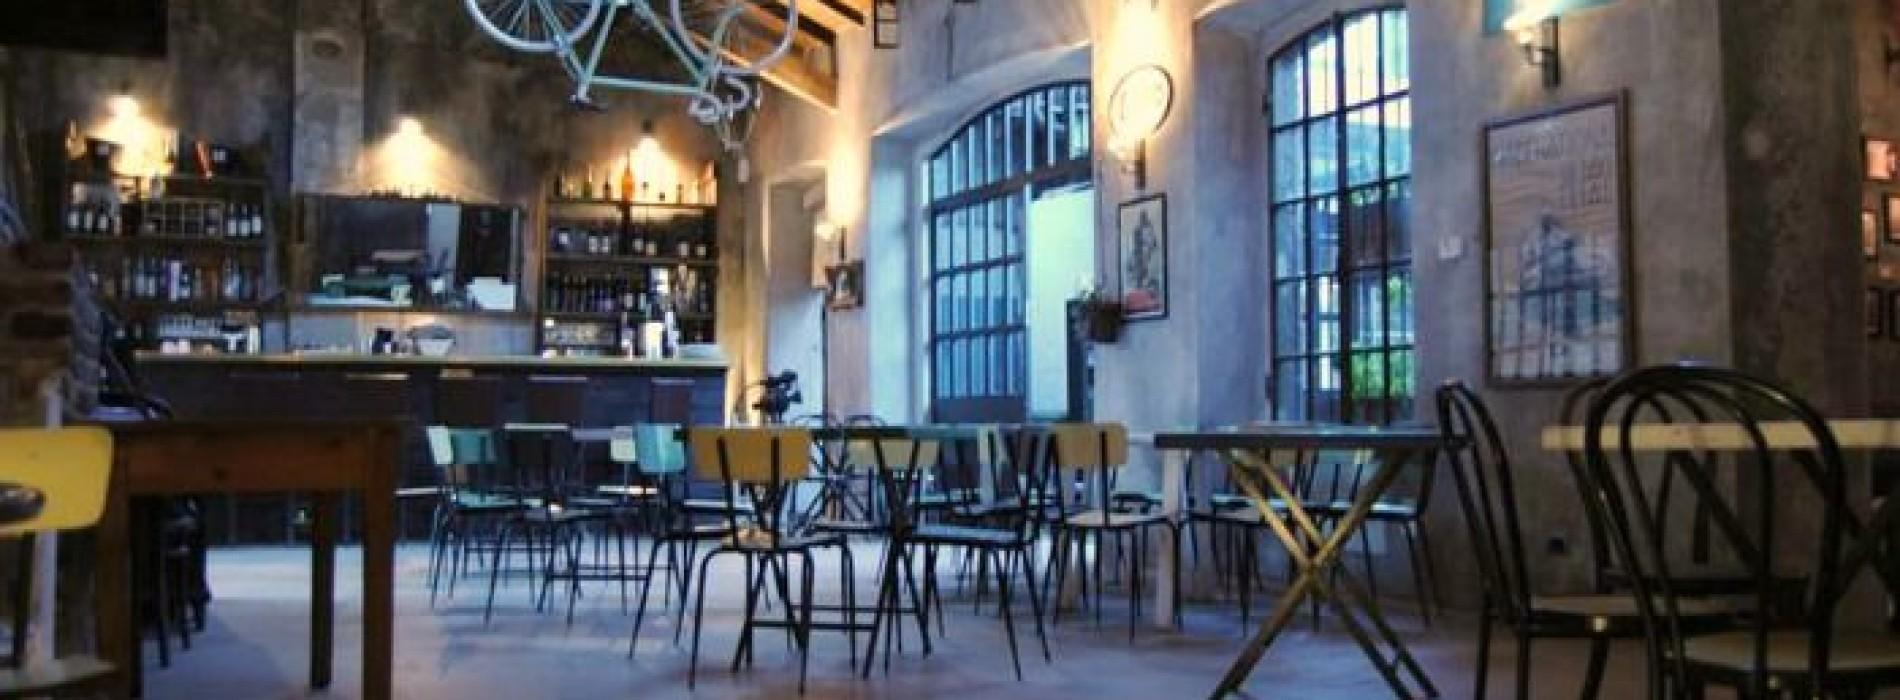 Brunch a Milano 2014: Fonderie Milanesi, Milano Bakery e Dedans le novità del weekend